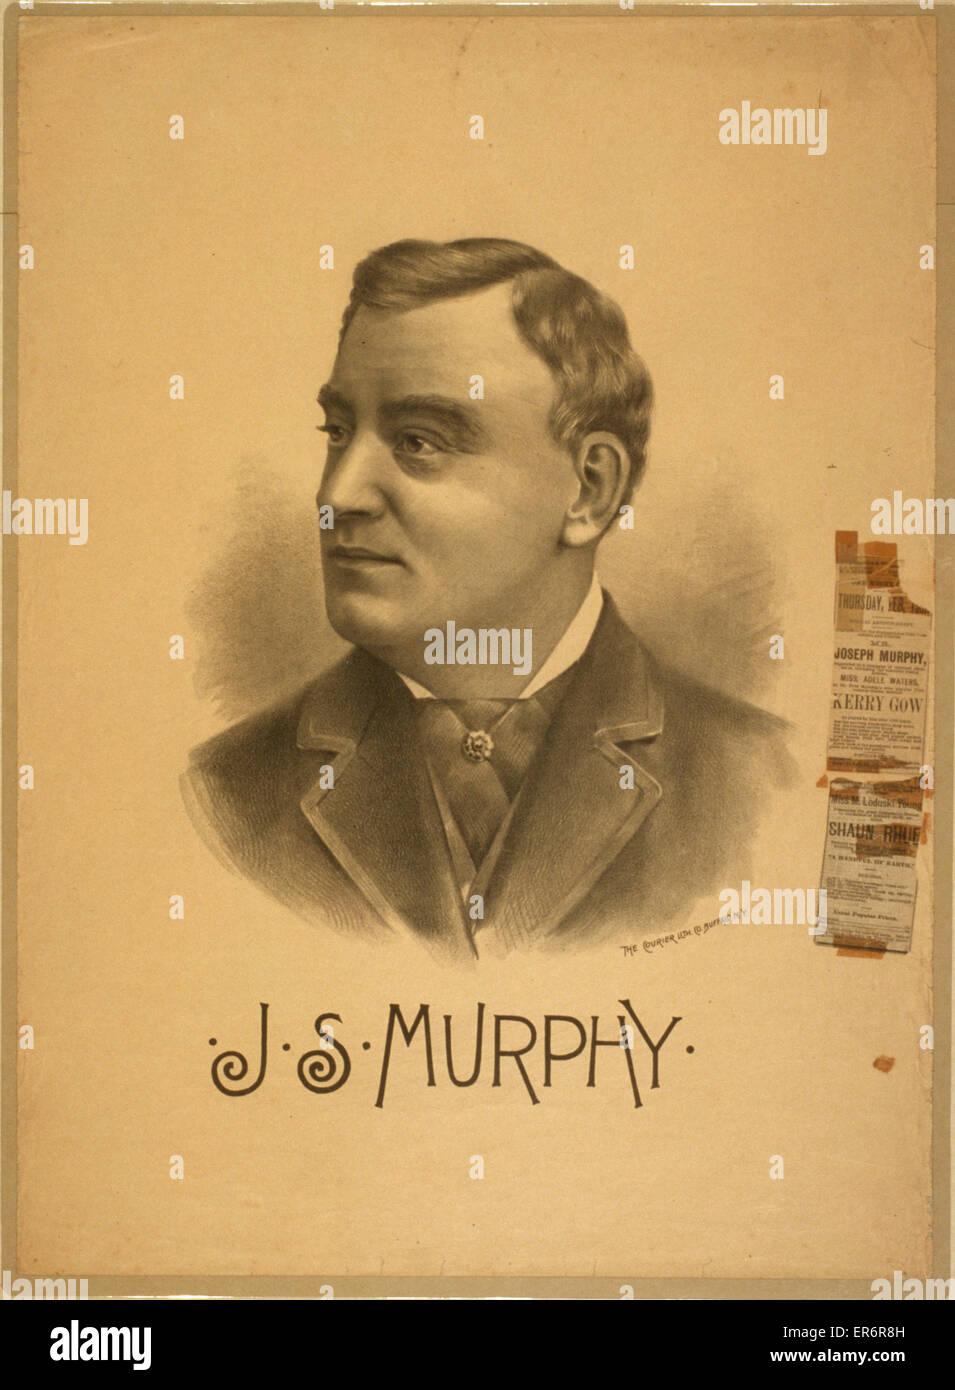 JS Murphy. Date ca. 1911. - Stock Image